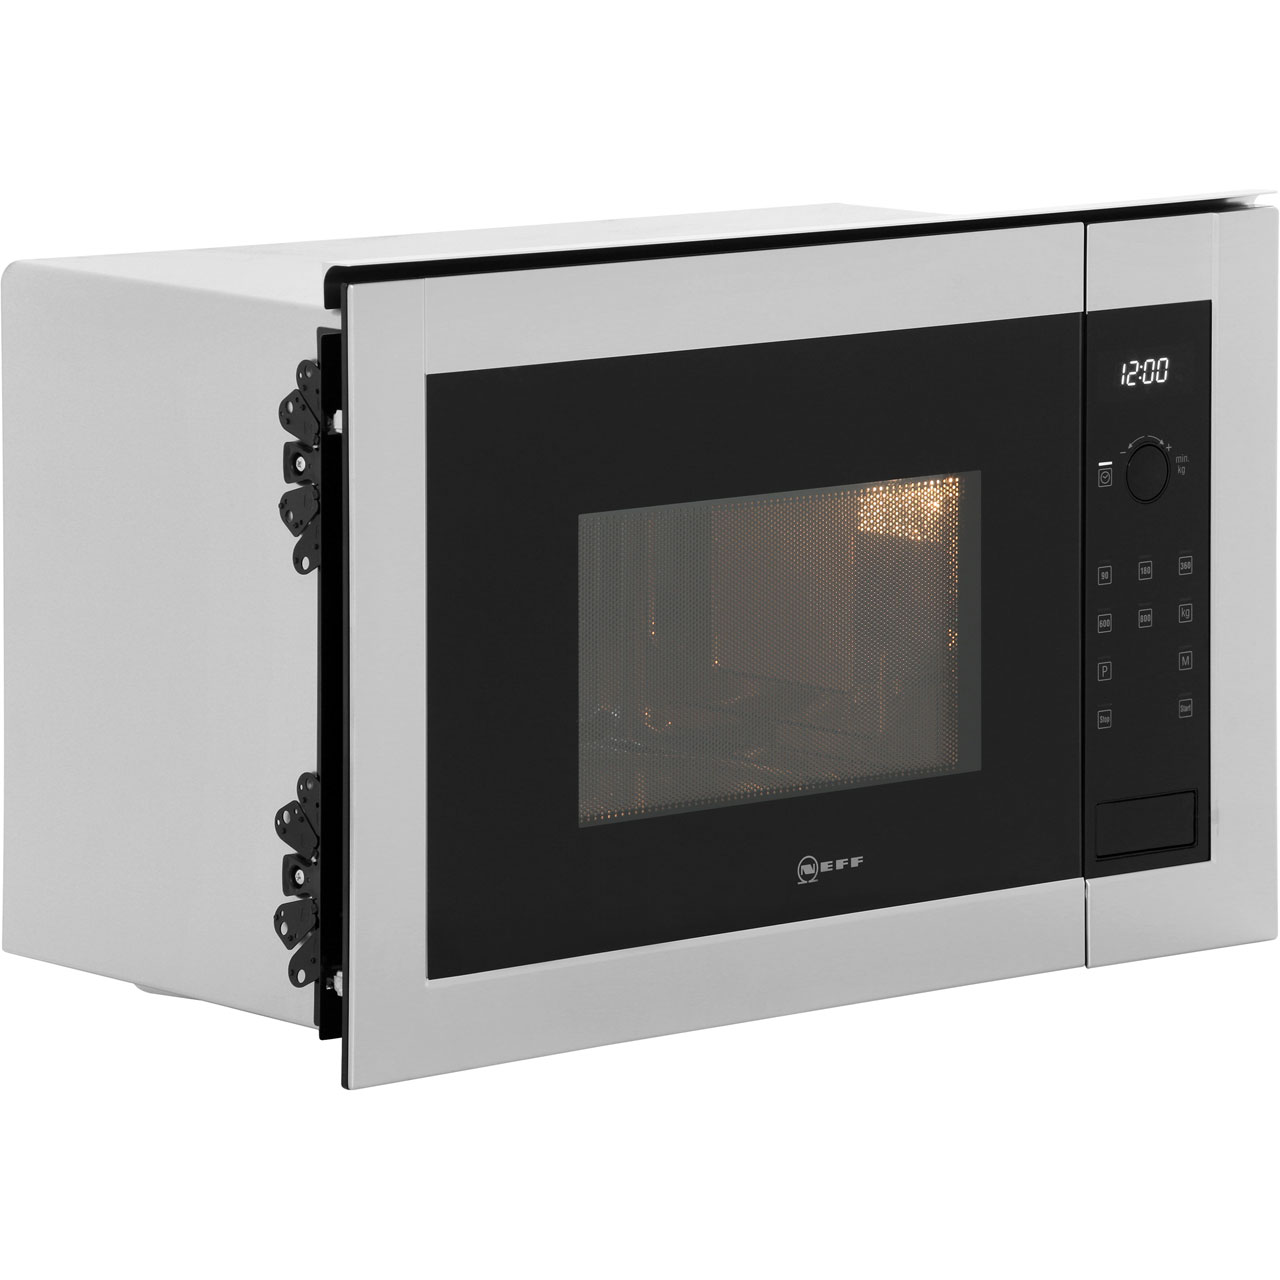 boots kitchen appliances washing machines fridges more our images 7